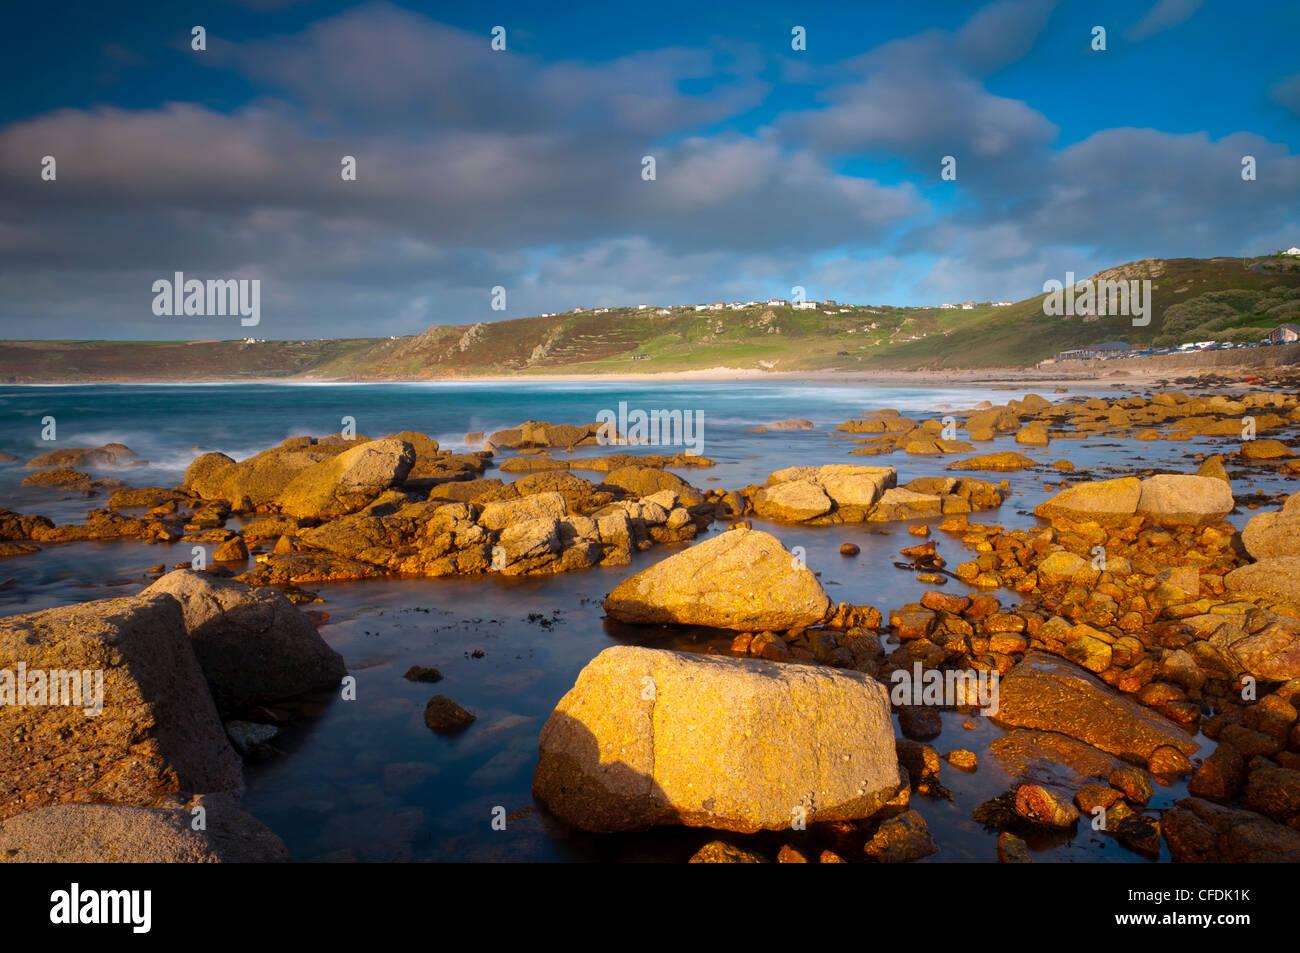 Sennen Cove, Whitesand Bay, Cornwall, Inglaterra, Reino Unido, Europa Imagen De Stock